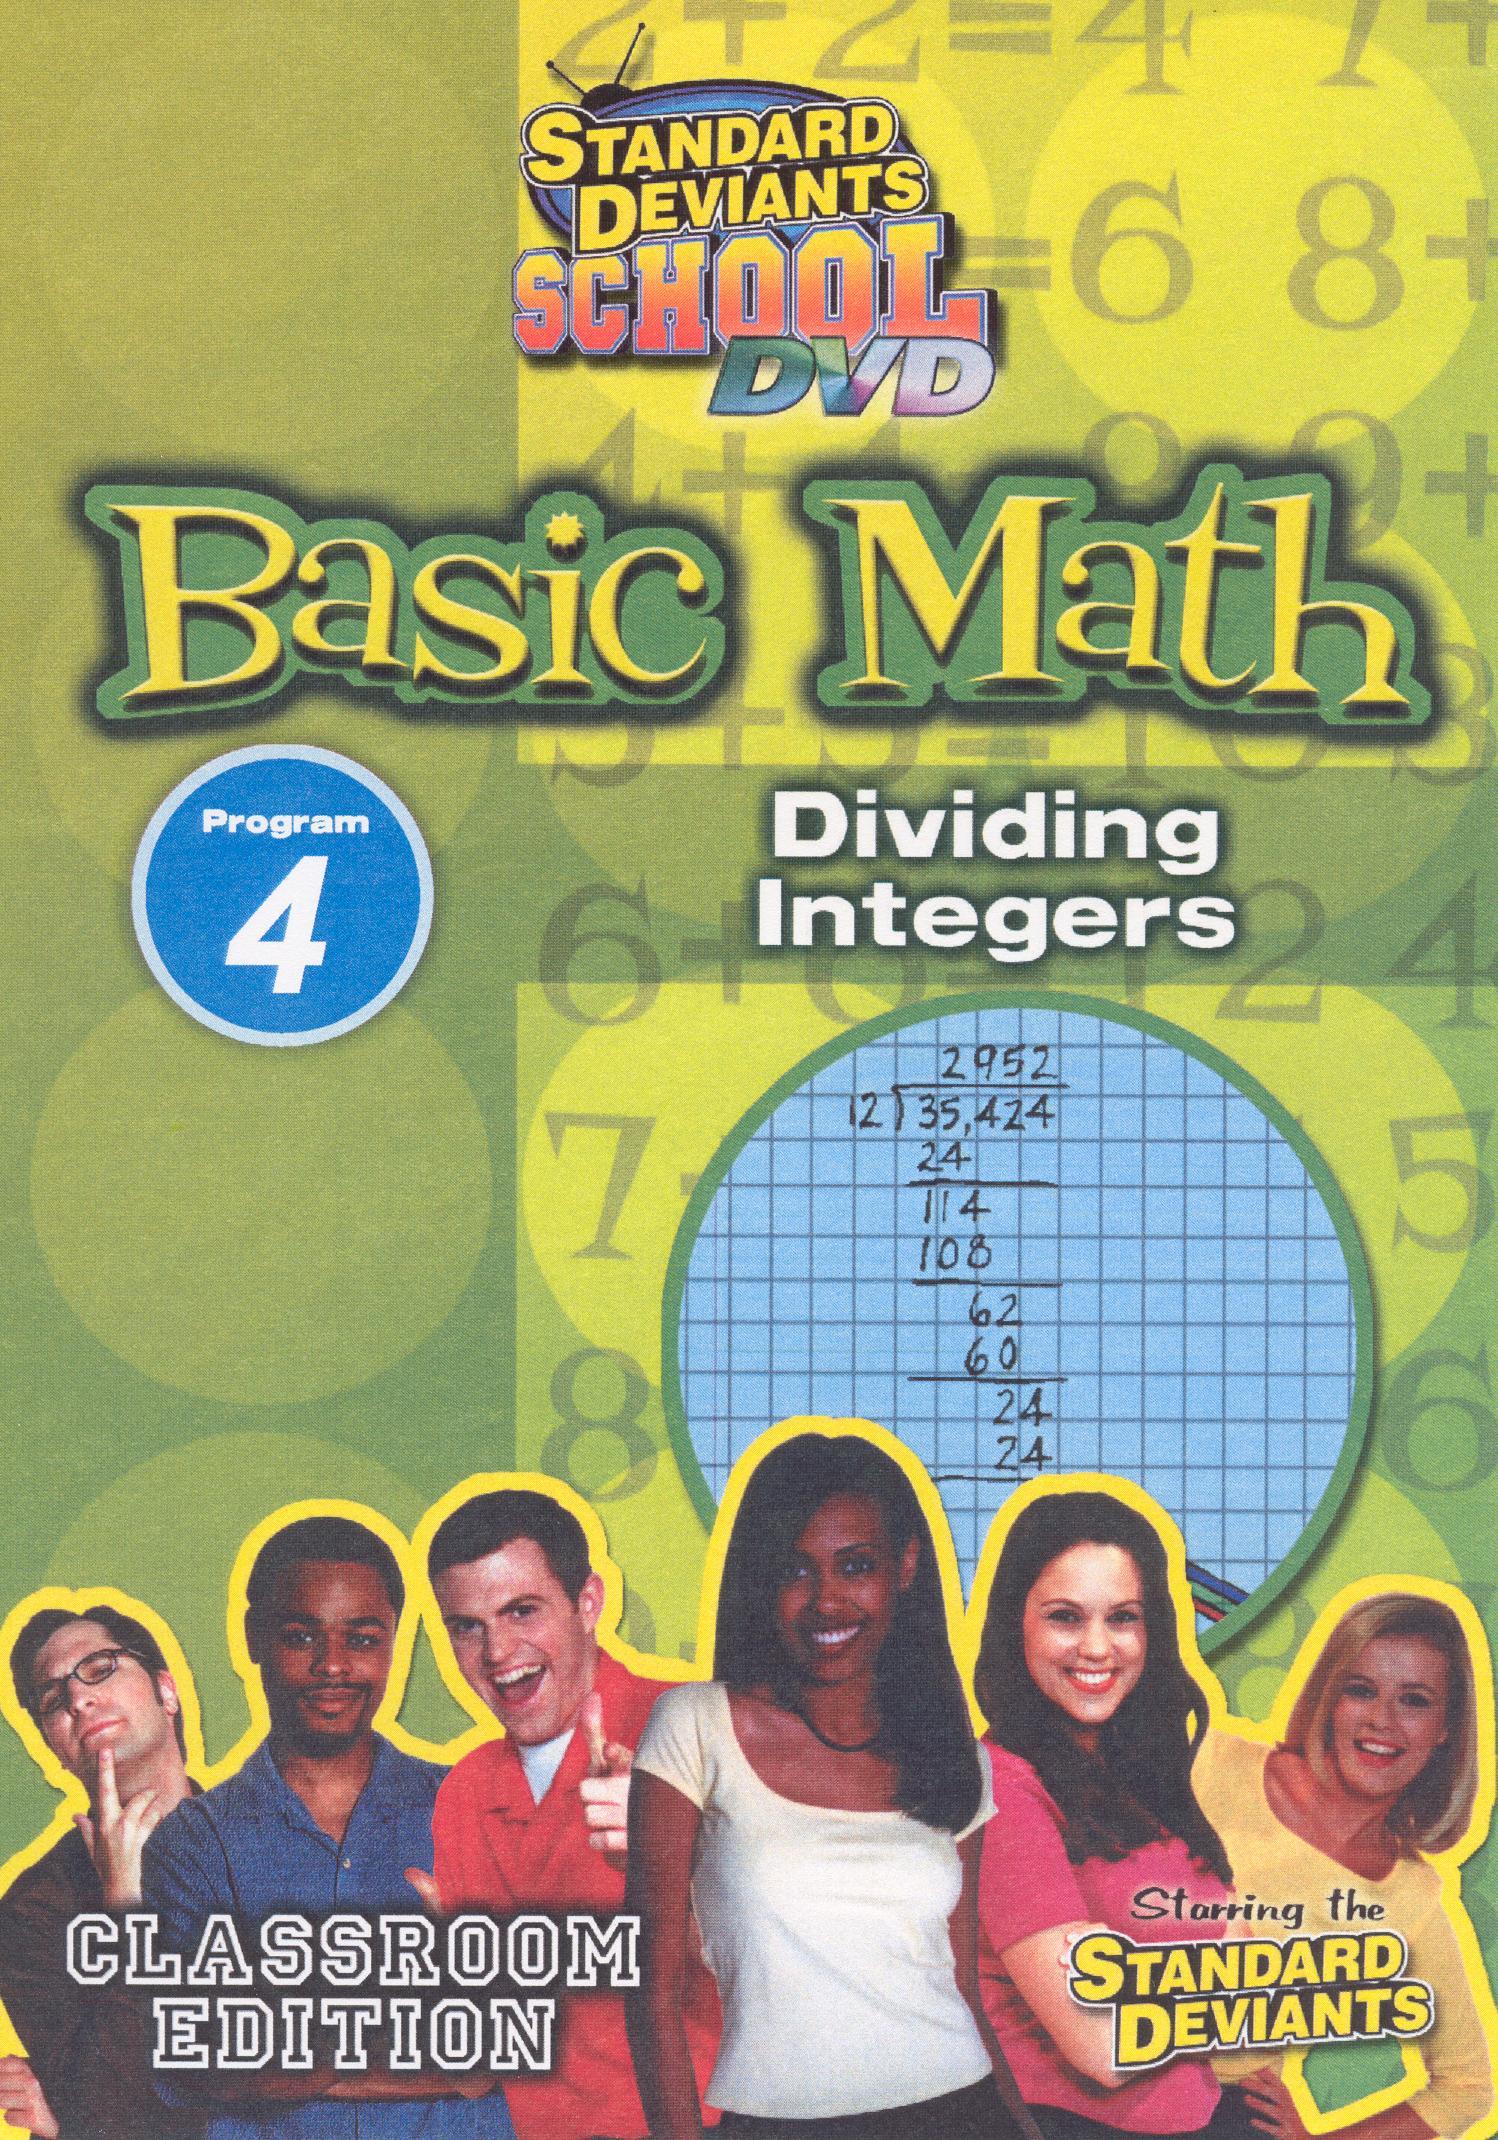 Standard Deviants School: Basic Math, Program 4